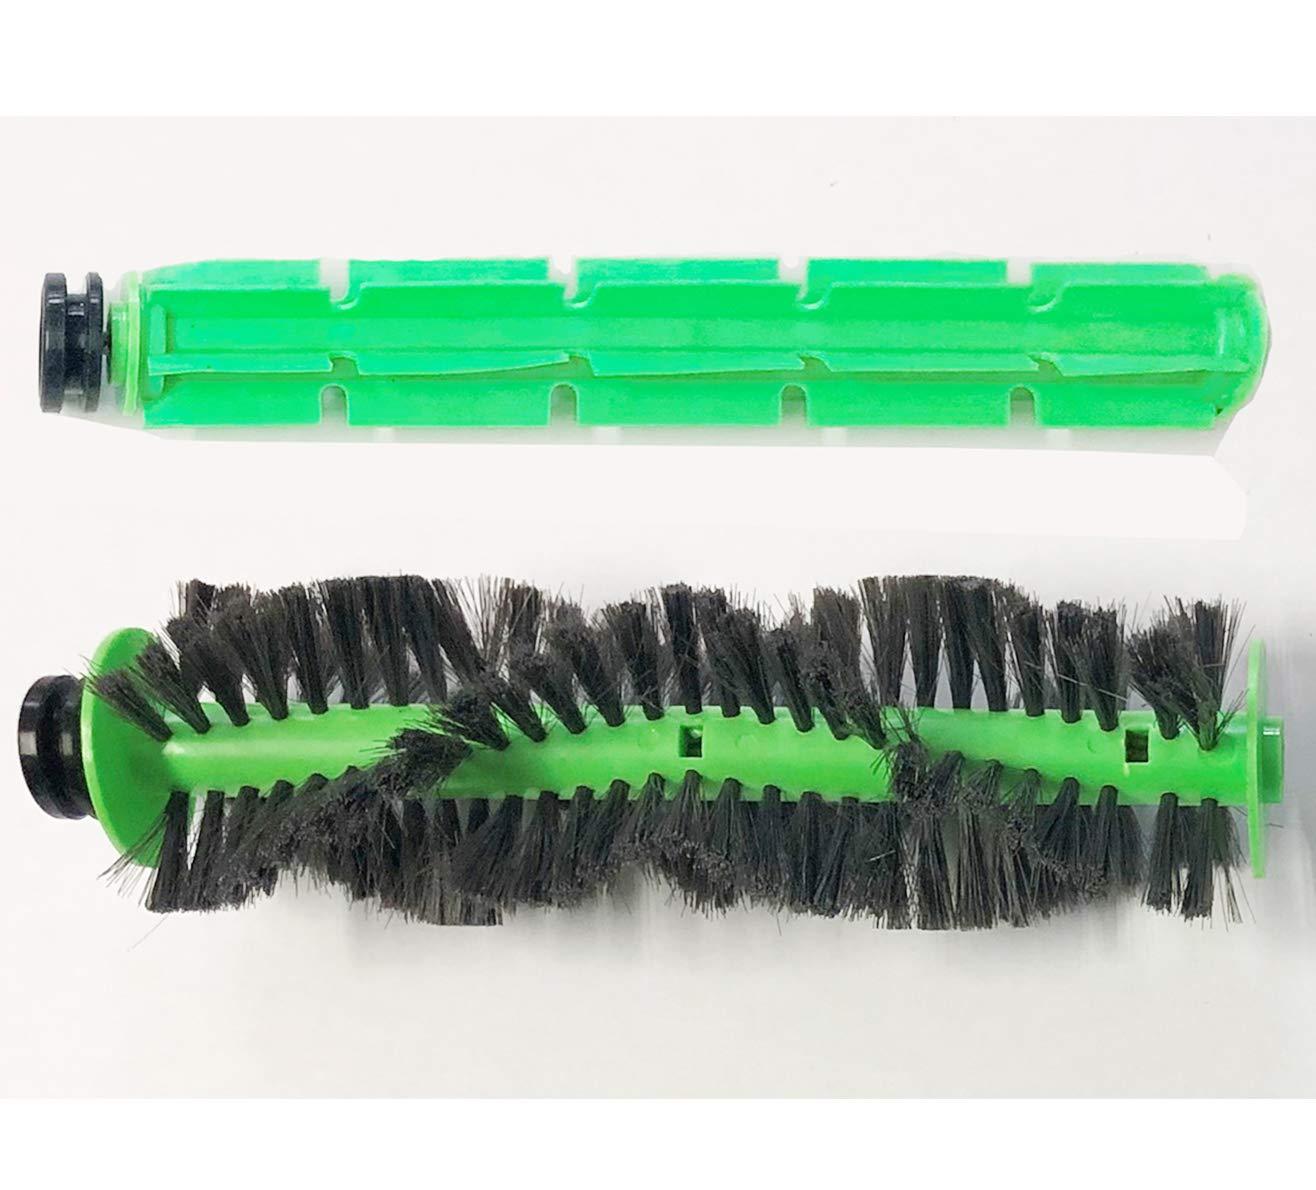 ECO-998 R1 recambio para aspirador Absolut Carbon ECO-DE ...